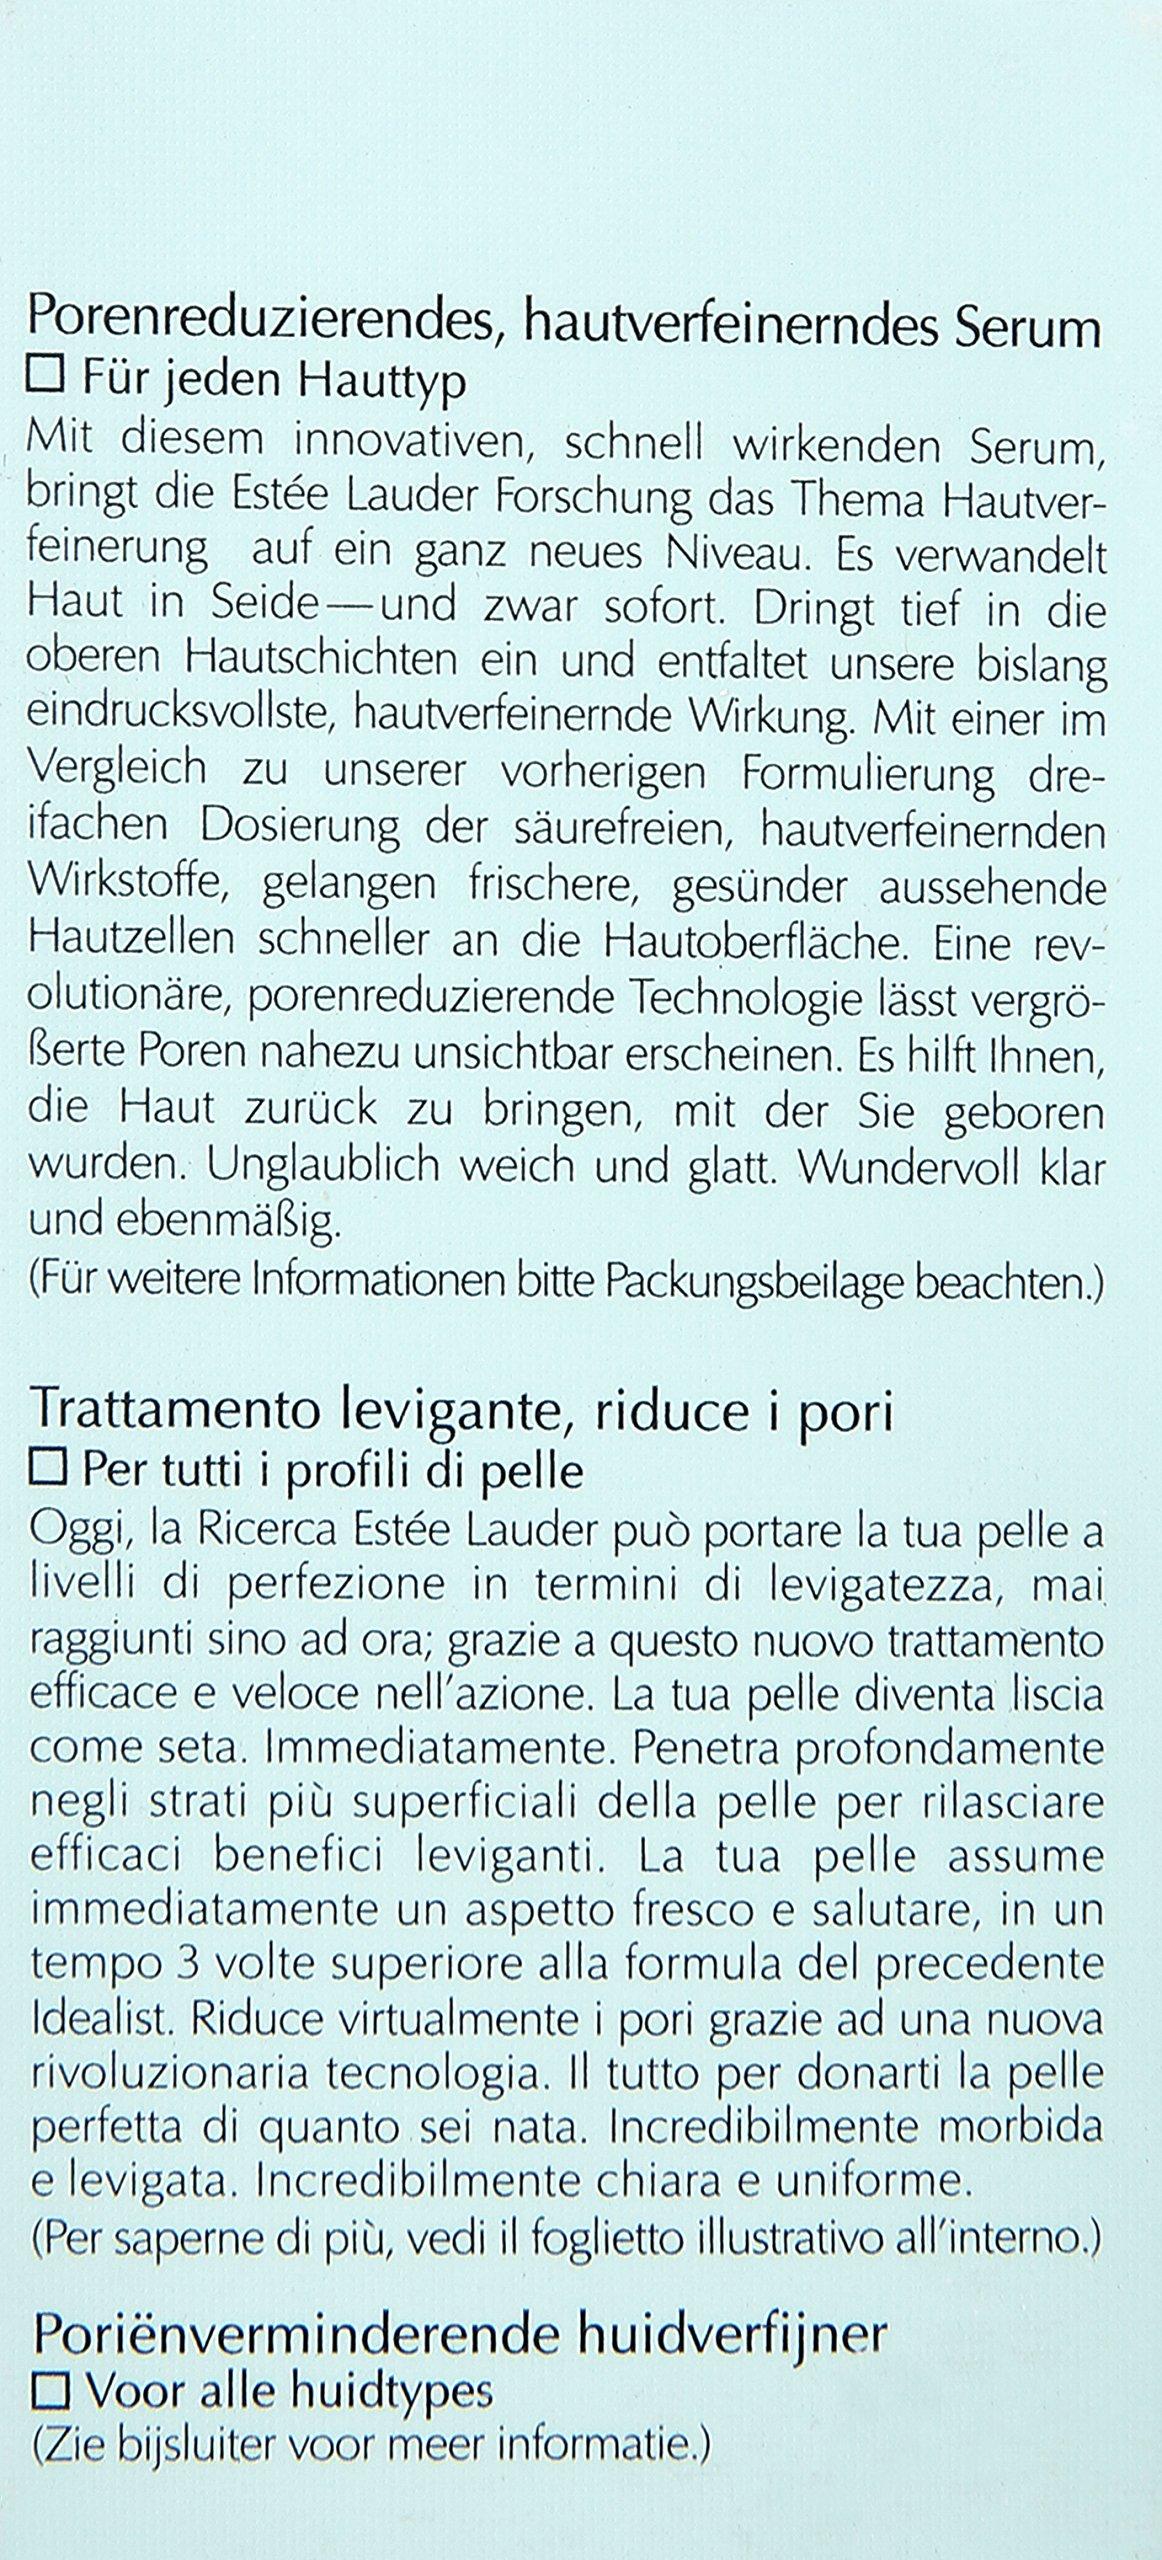 Estee Lauder Idealist Pore Minimizing Skin Refinisher, 1.7 Ounce by Estee Lauder (Image #4)